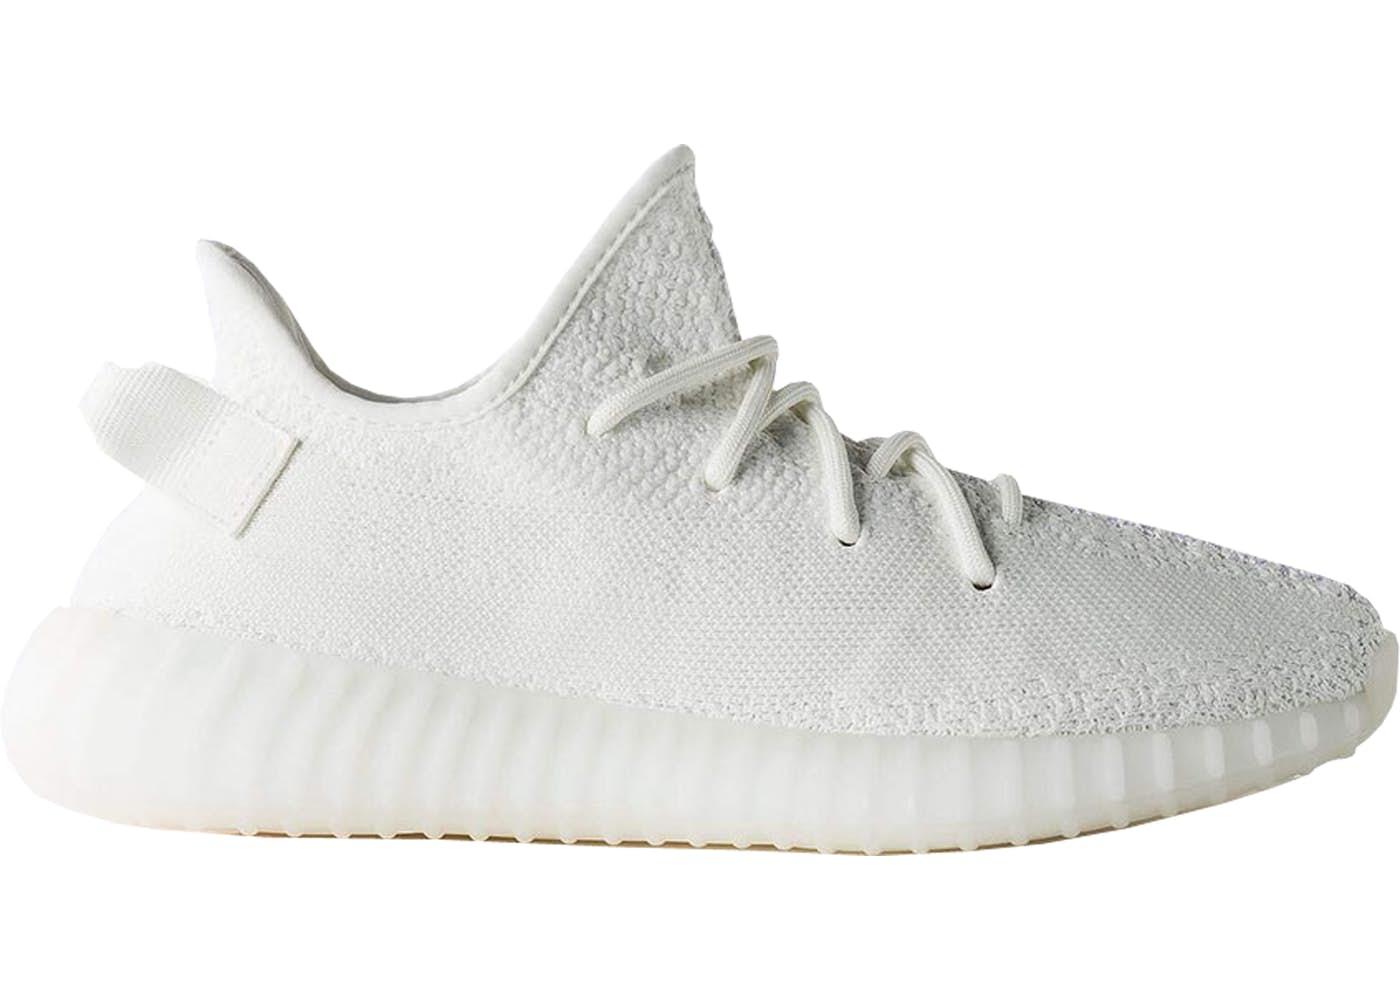 f2d7880cf adidas Yeezy 350 Boost V2 Cream   White Sneaker Myth